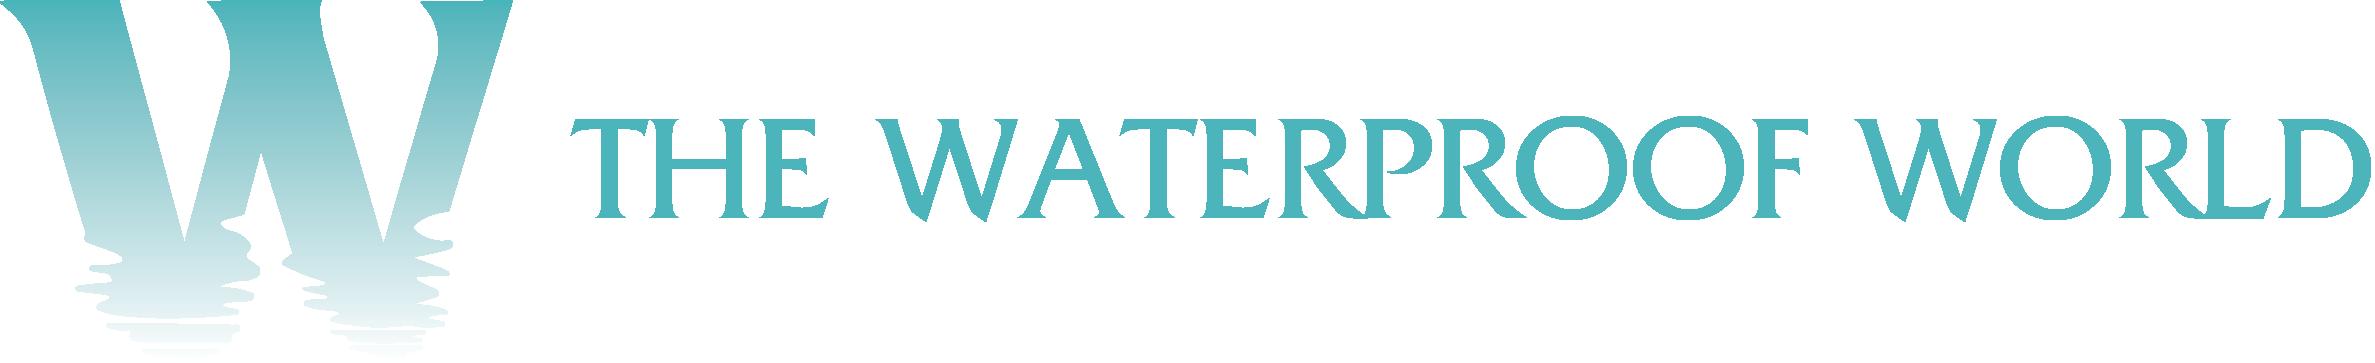 The Waterproof World